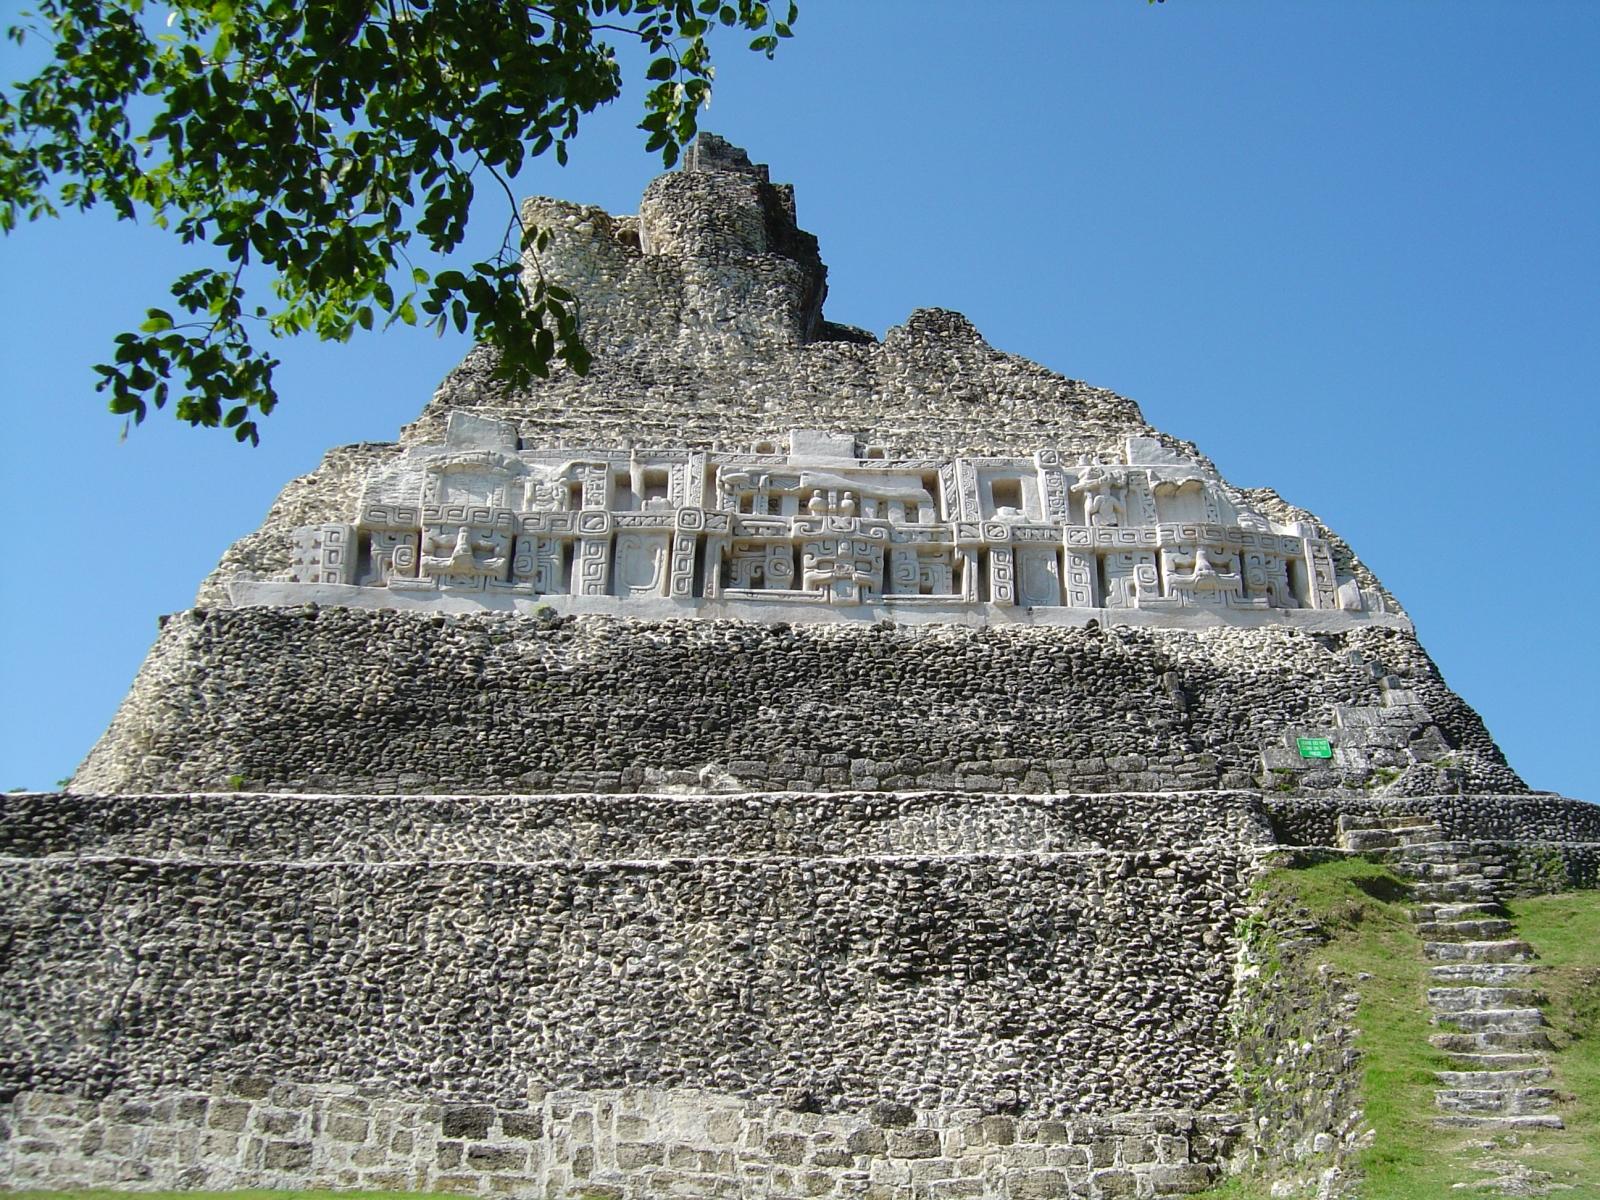 Mayan civilisation Xunantunich